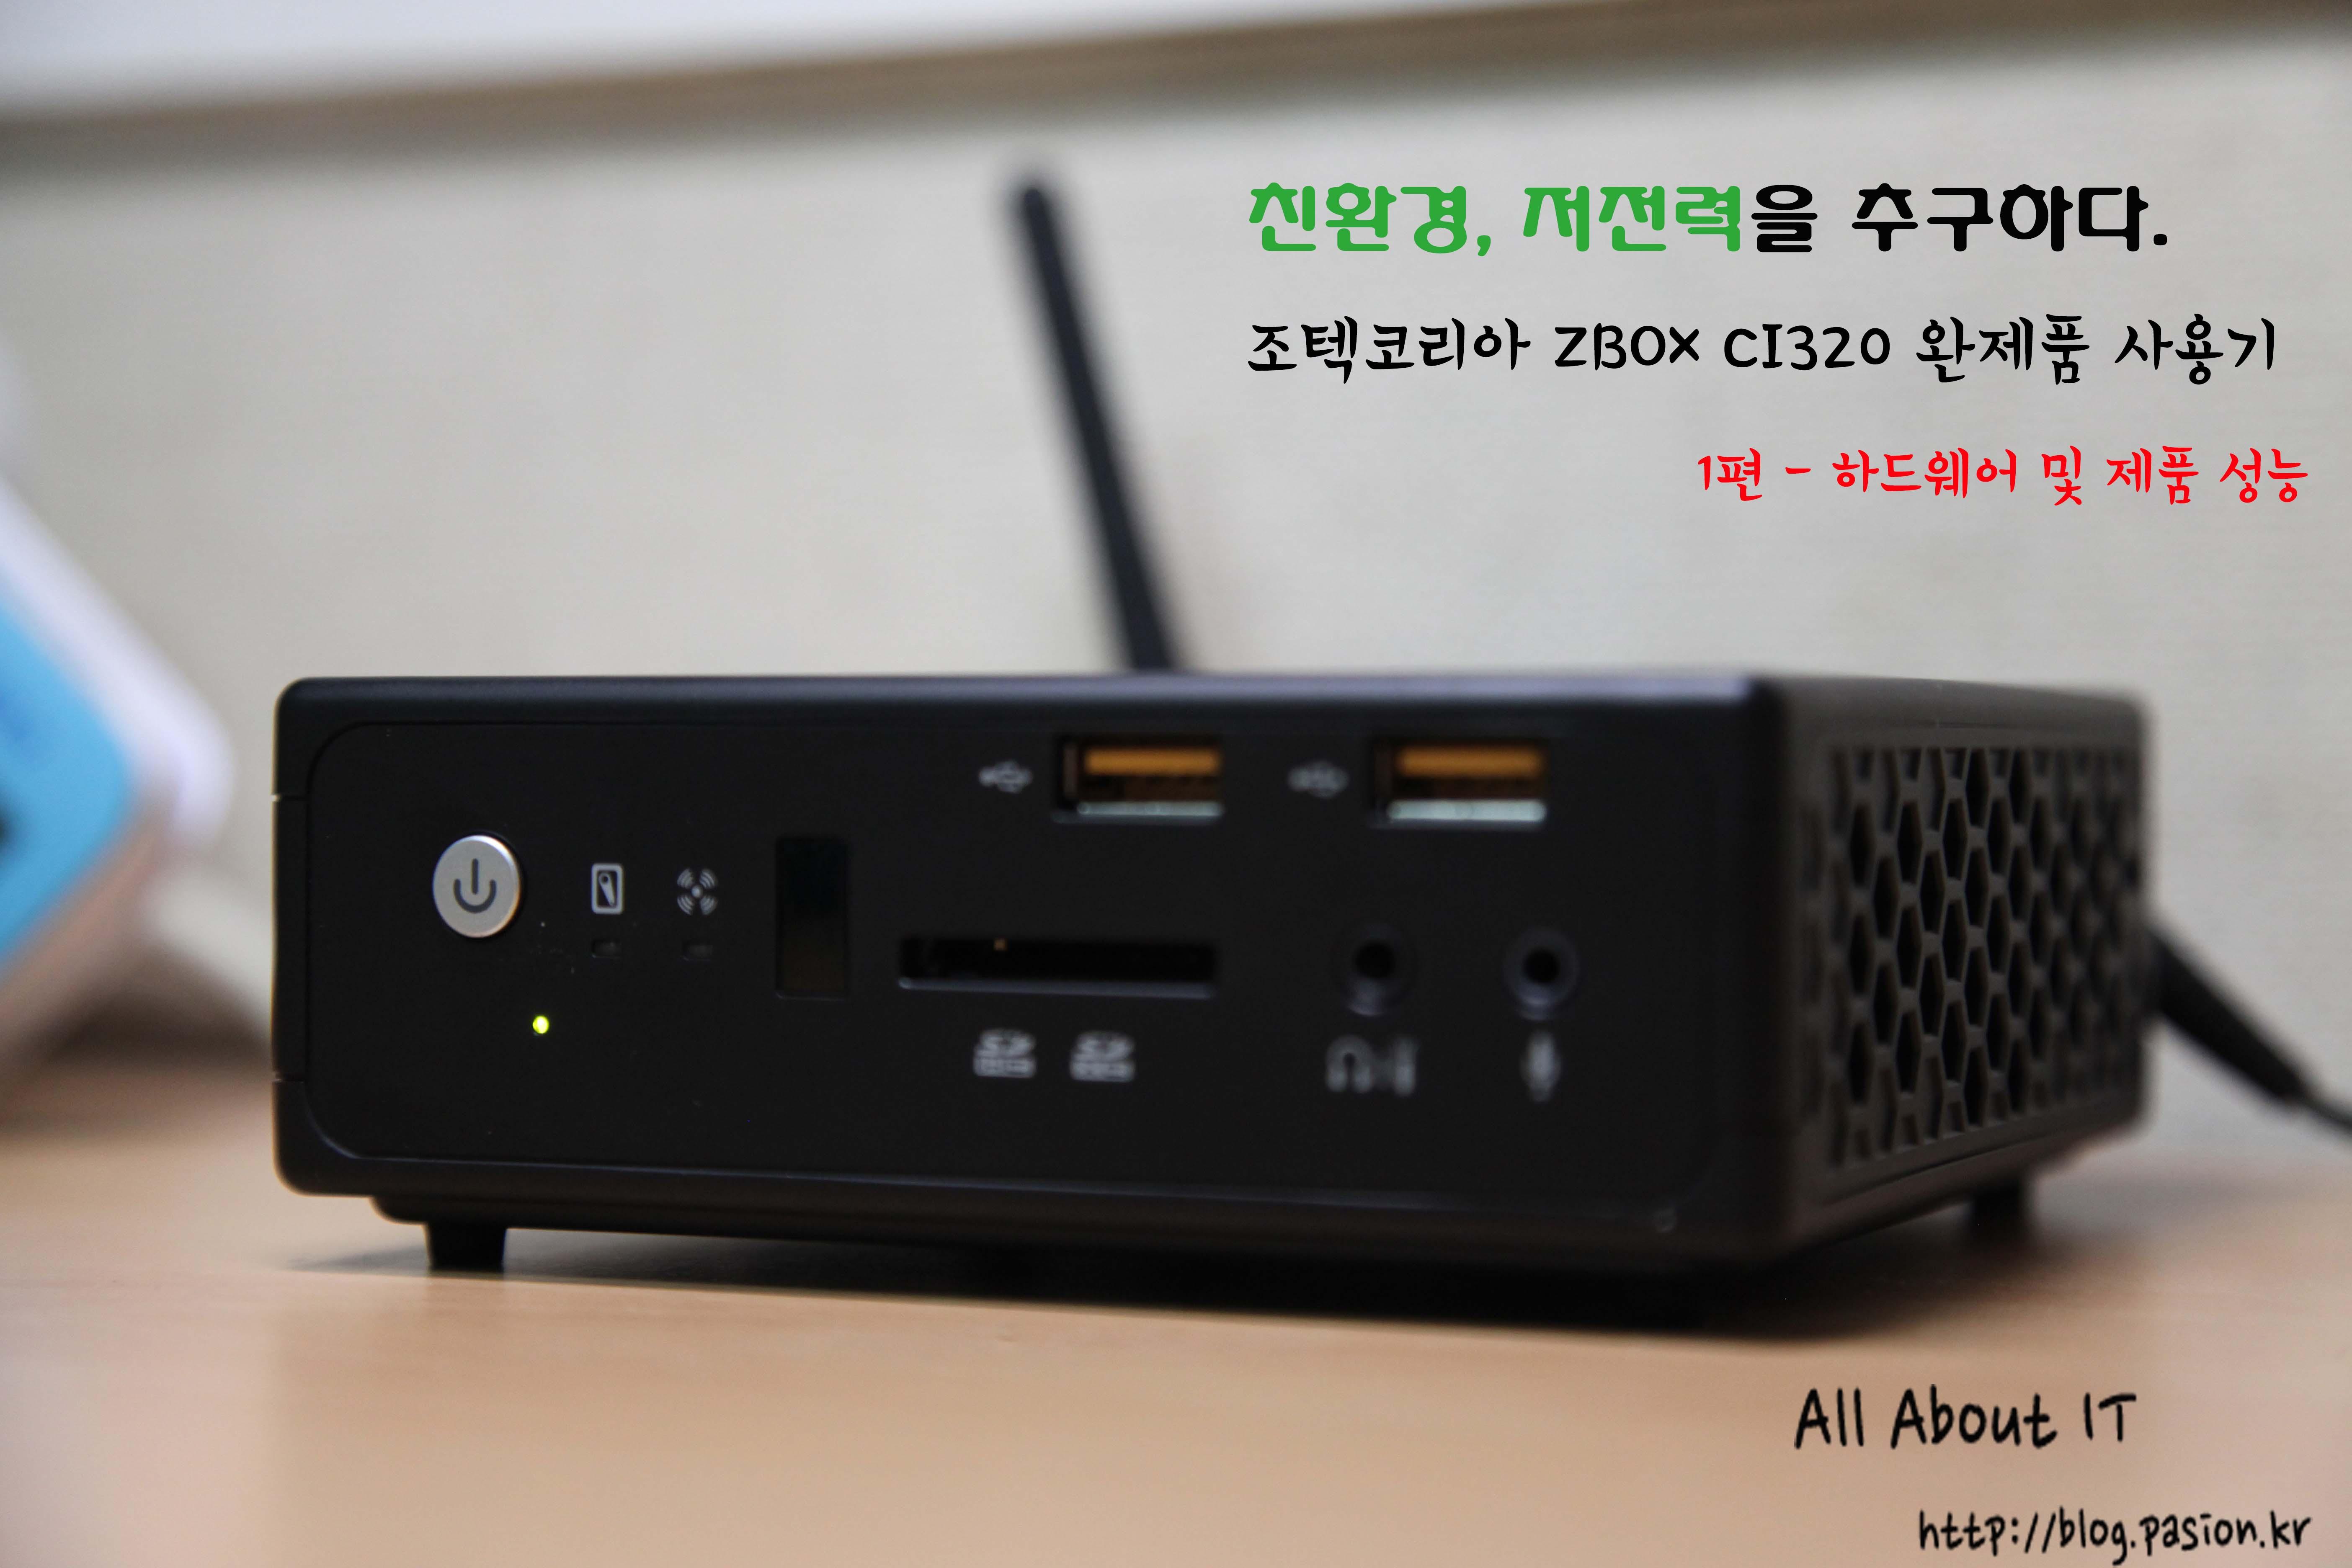 CI320-1편-메인페이지.jpg